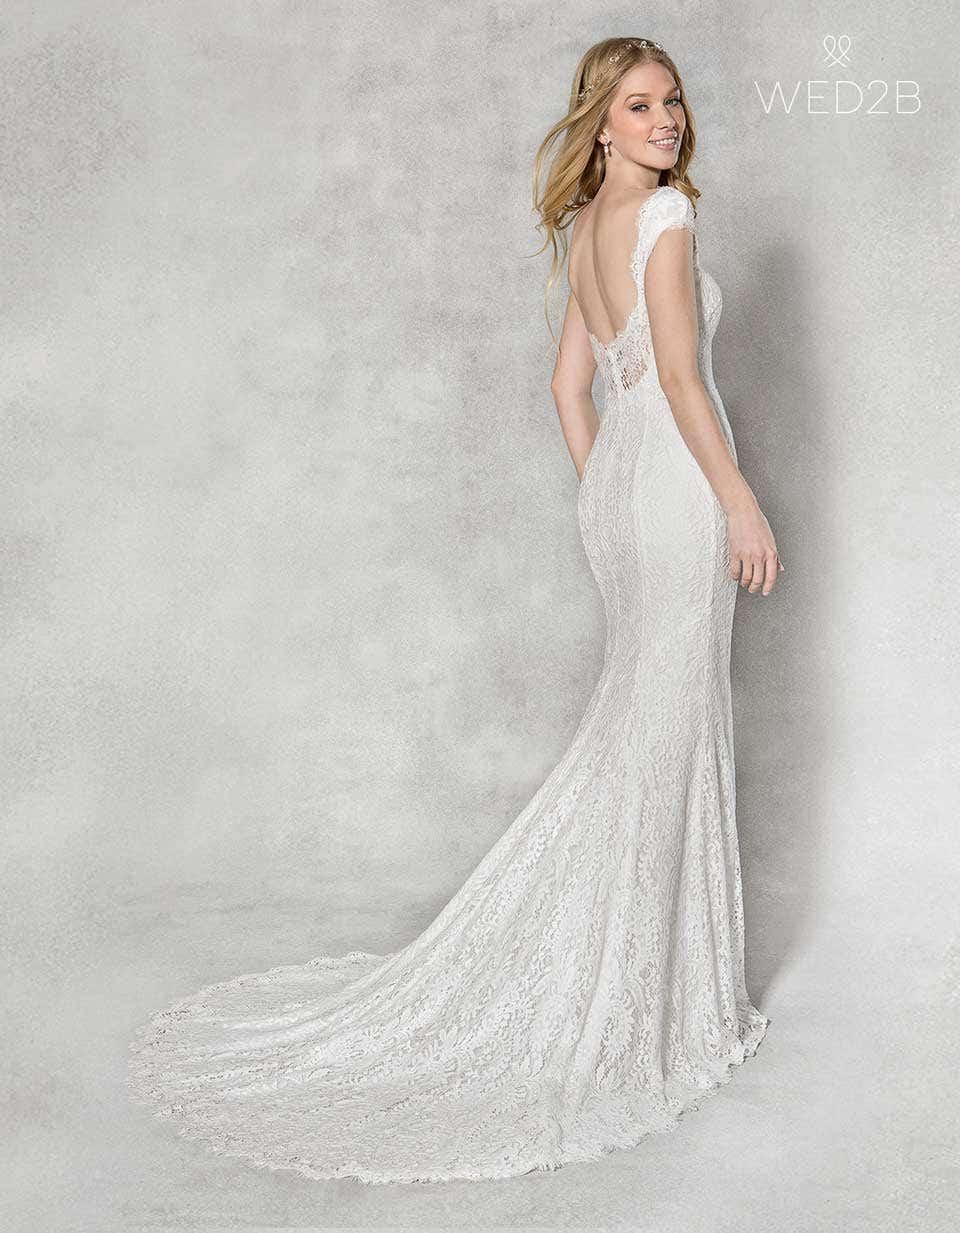 Summer-Embroidered wedding dresses